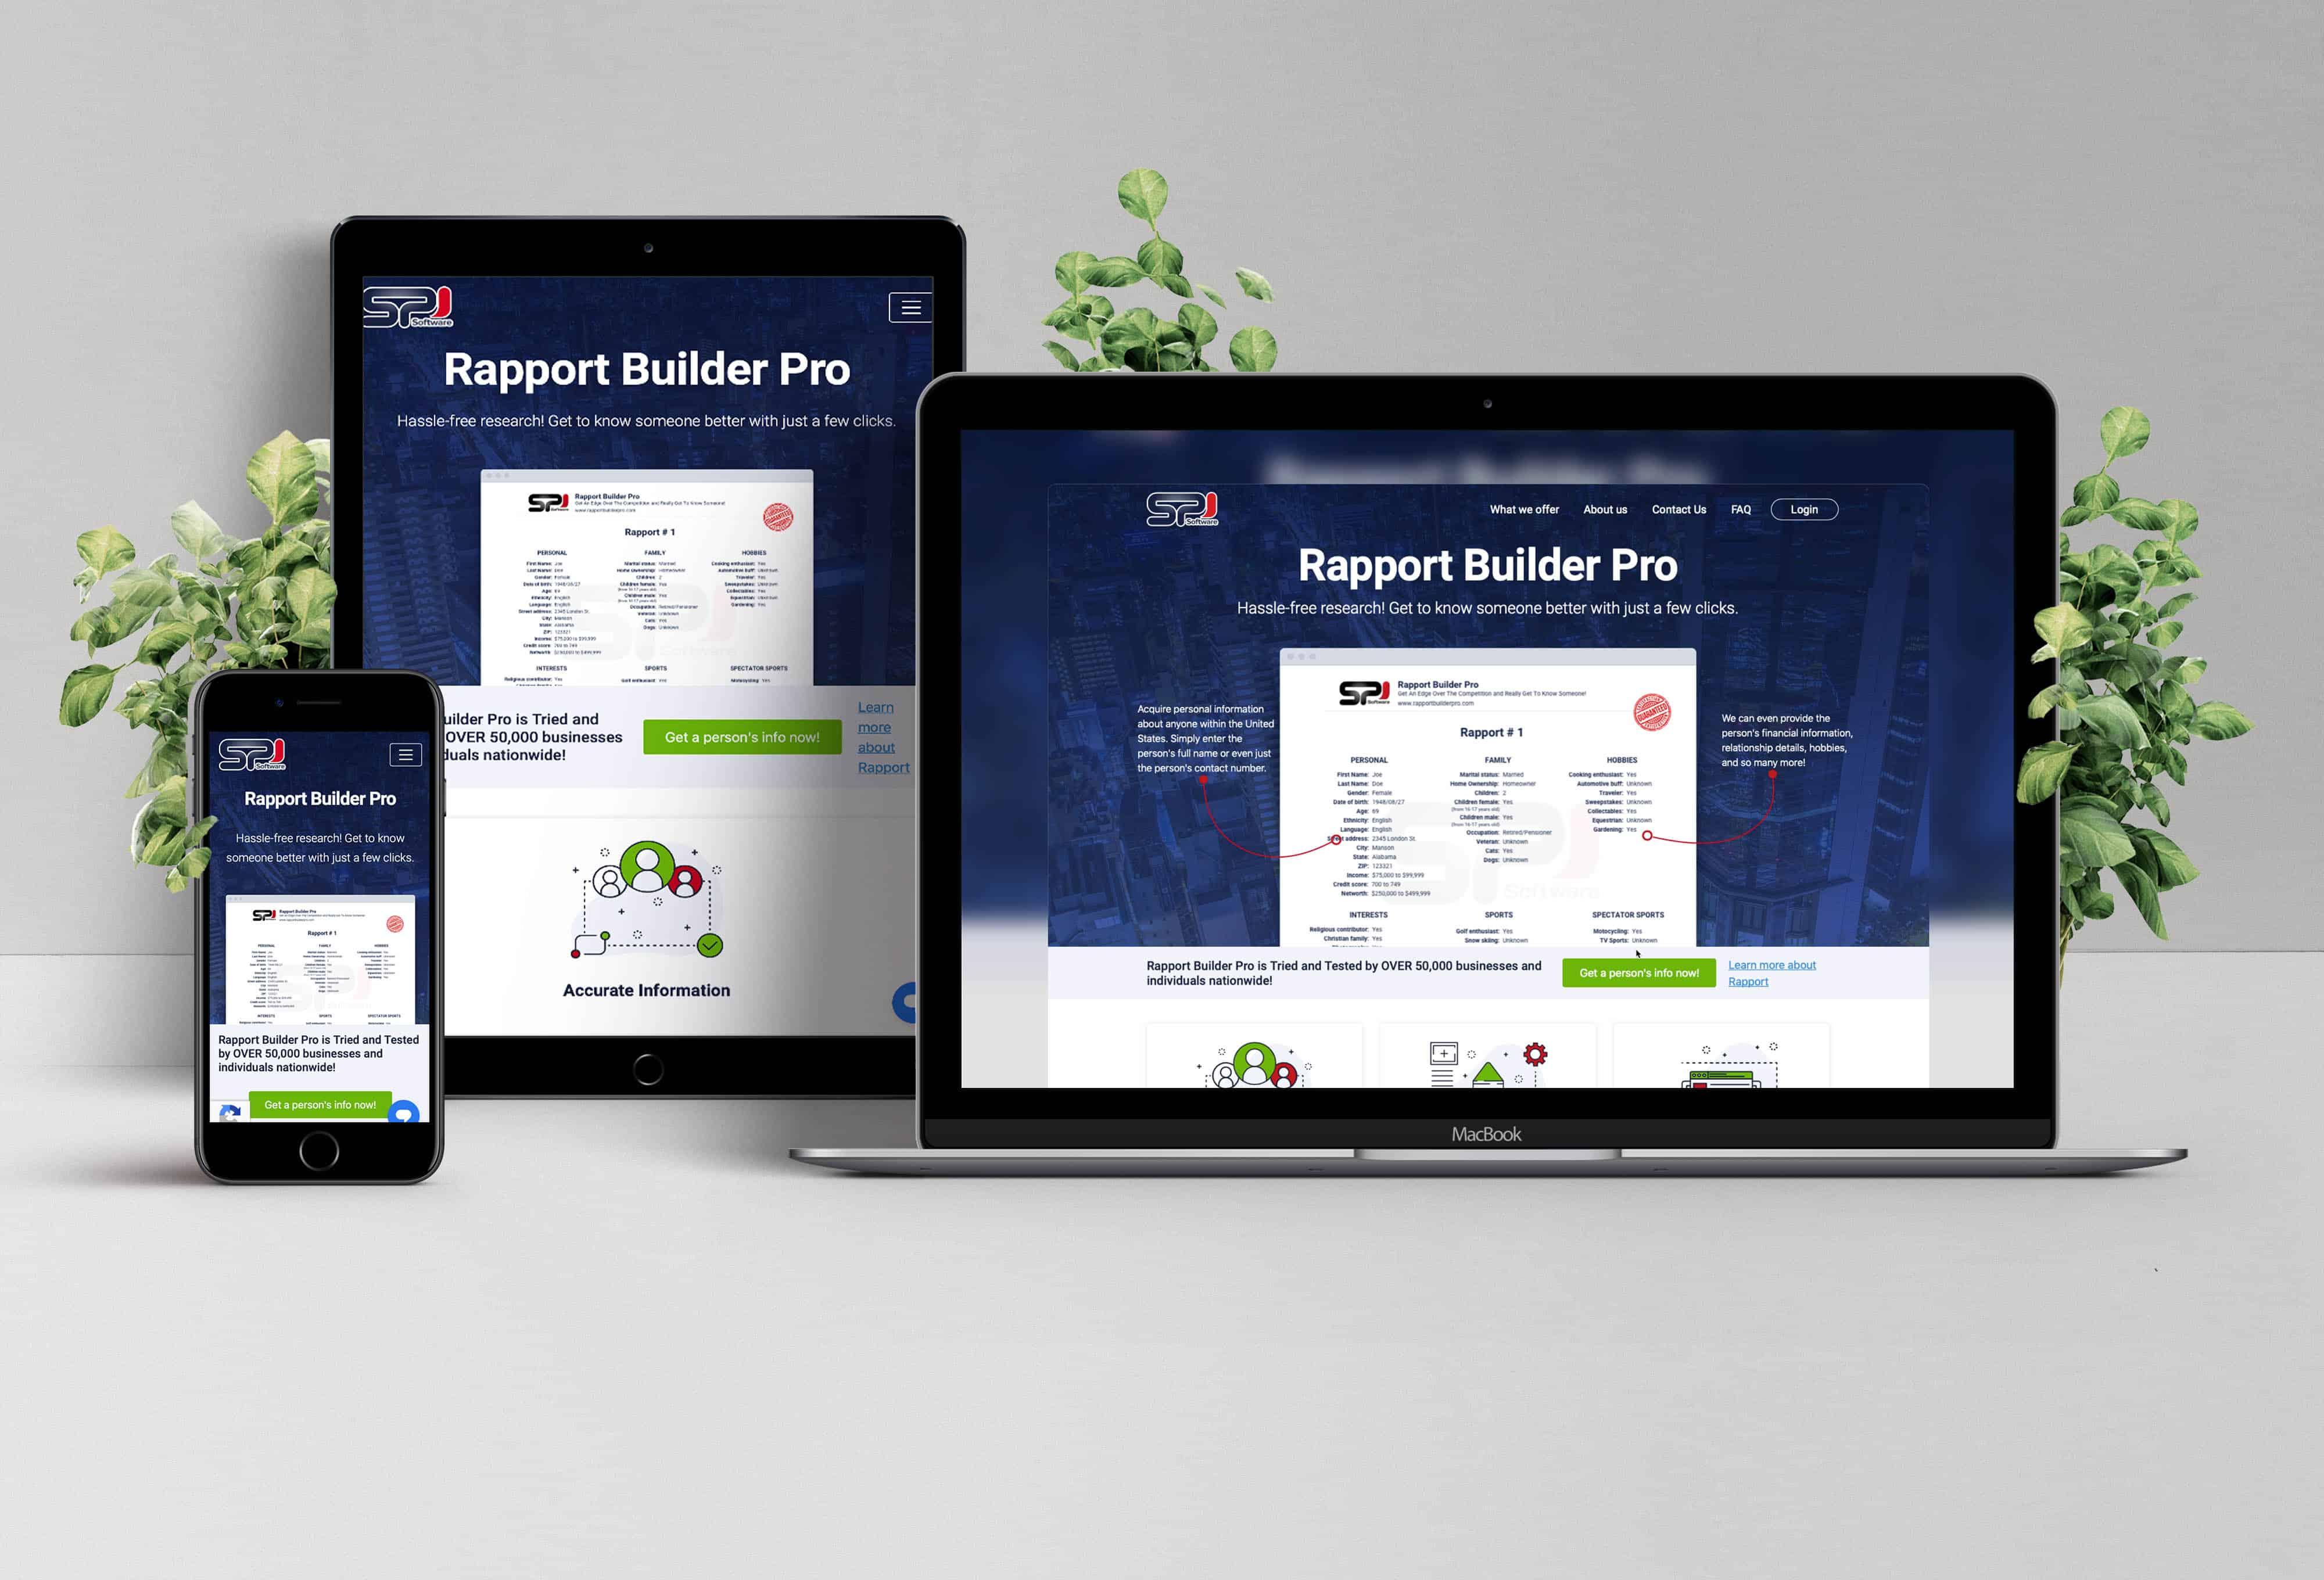 Custom Portal for Rapport Builder Pro